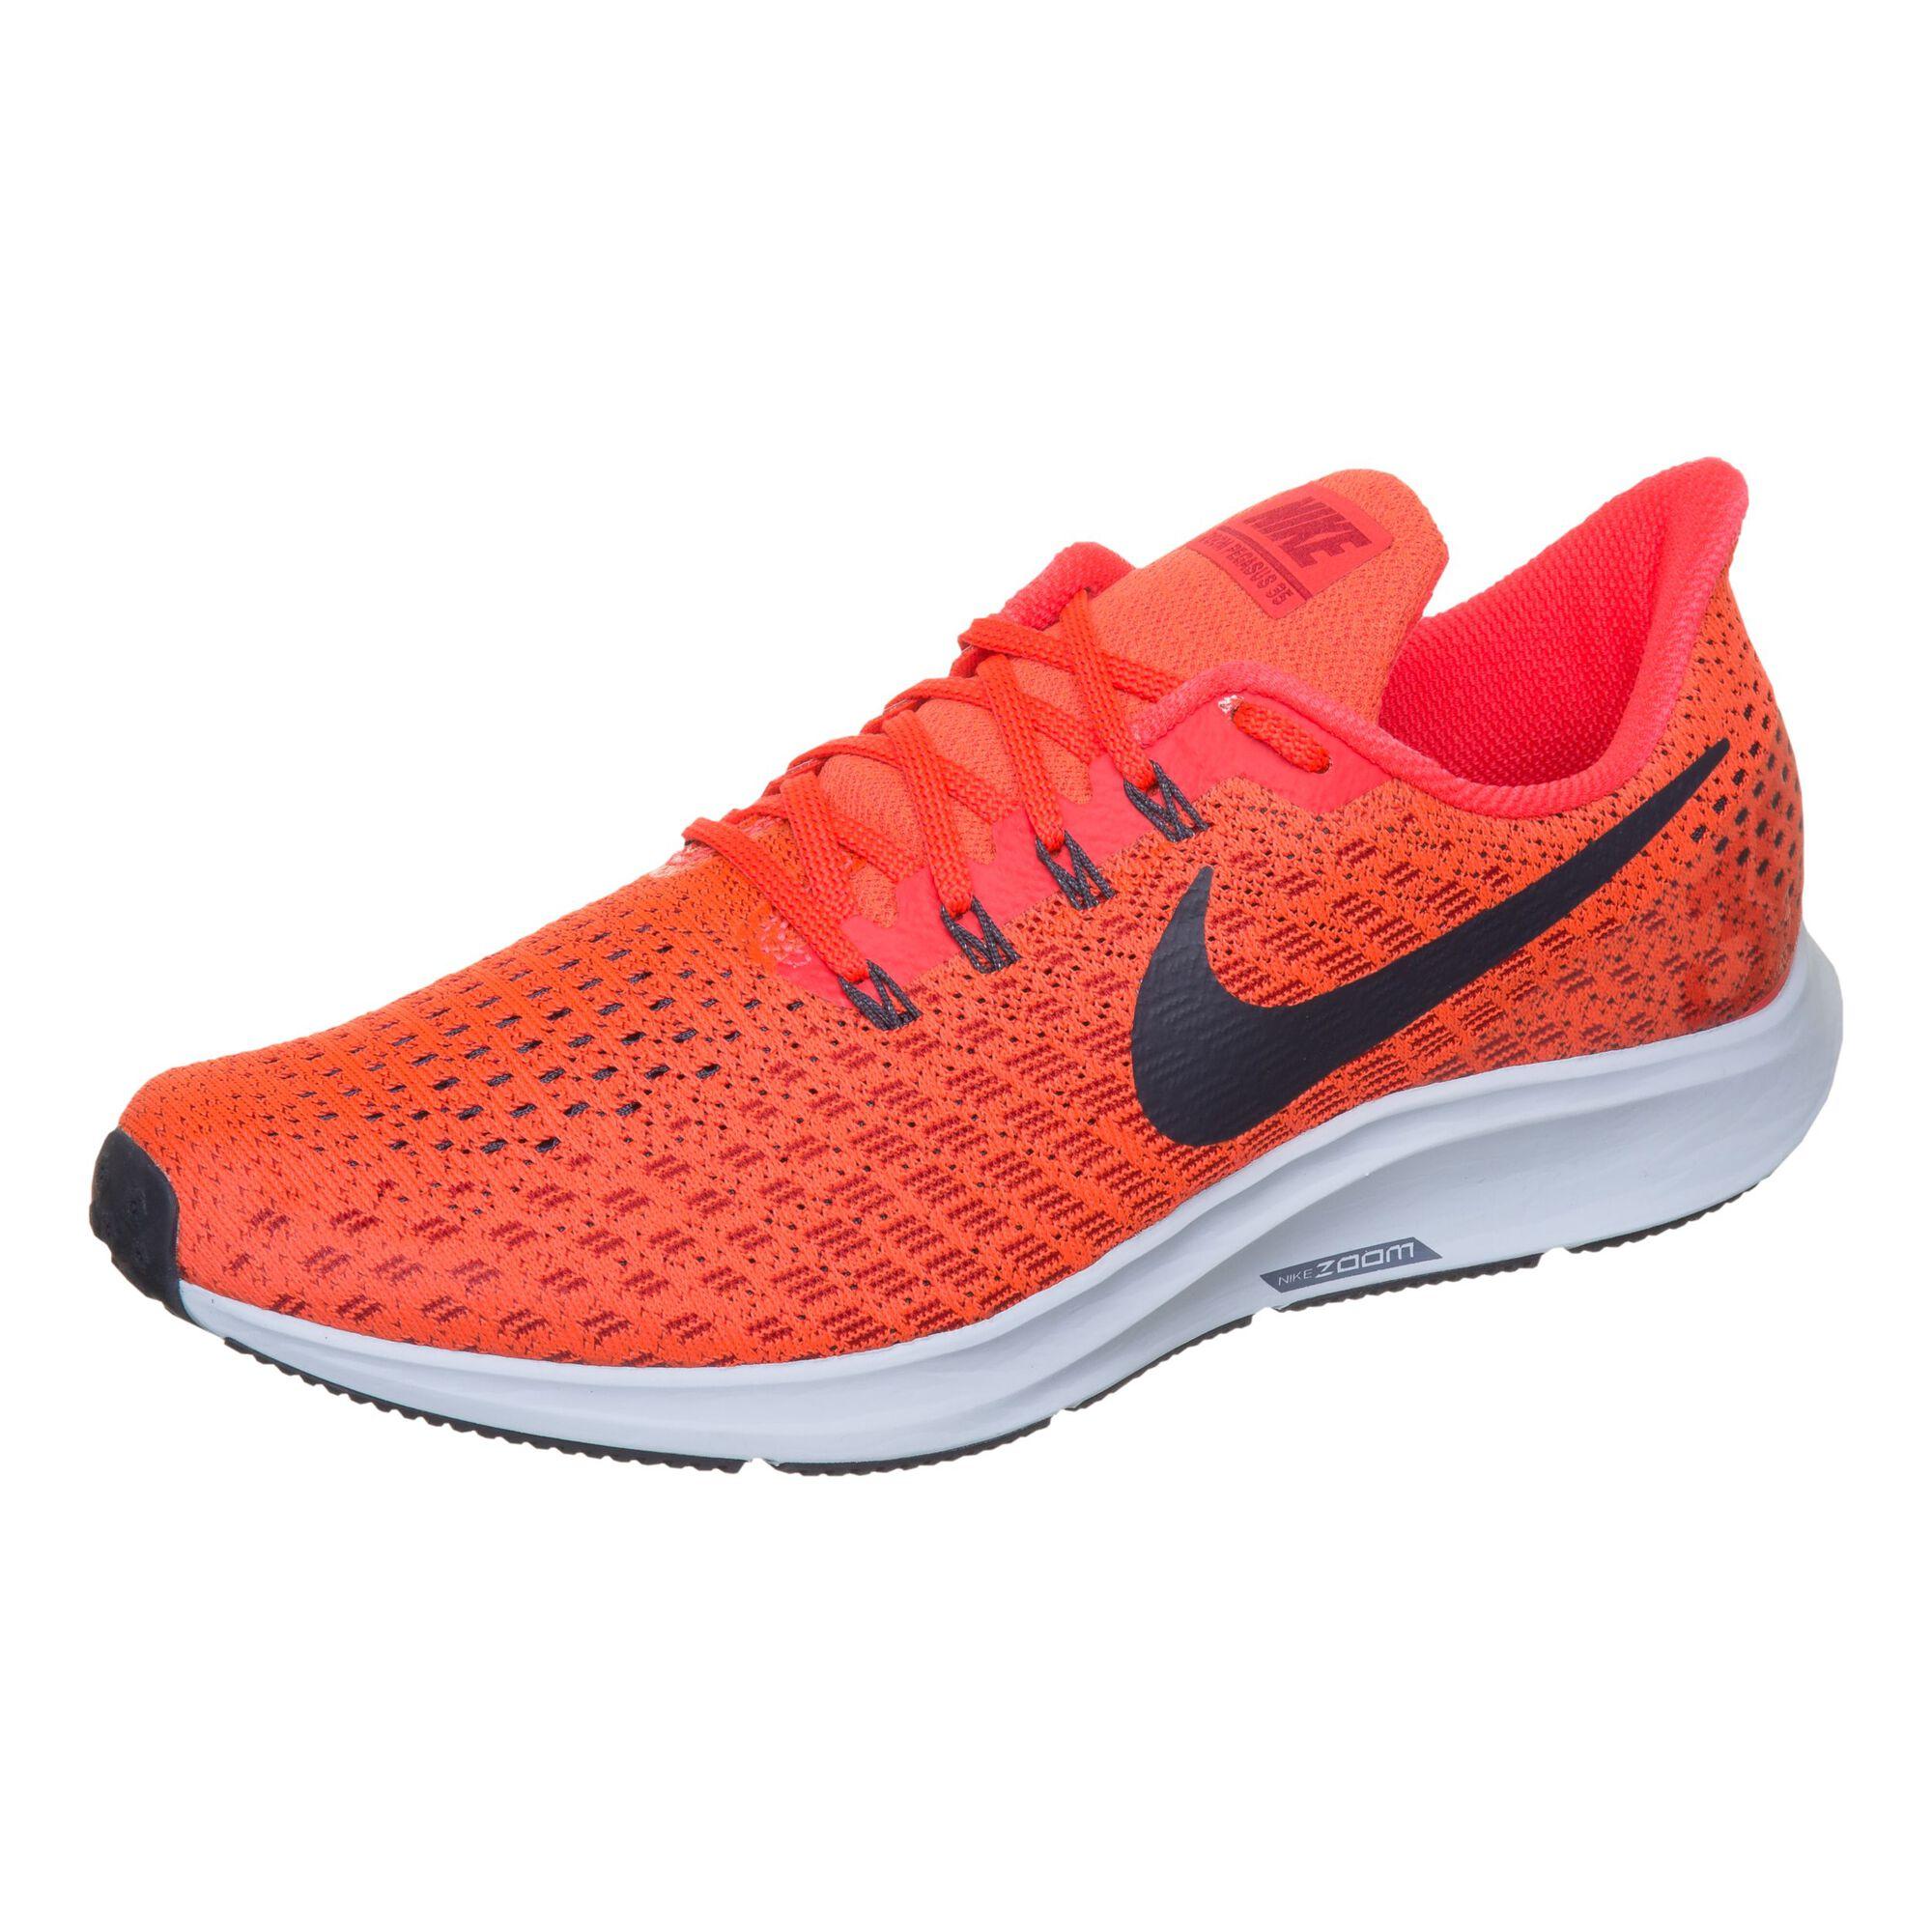 premium selection 6b5e0 ee0cb Nike  Nike  Nike  Nike  Nike  Nike  Nike  Nike  Nike  Nike. Air Zoom  Pegasus 35 Men ...